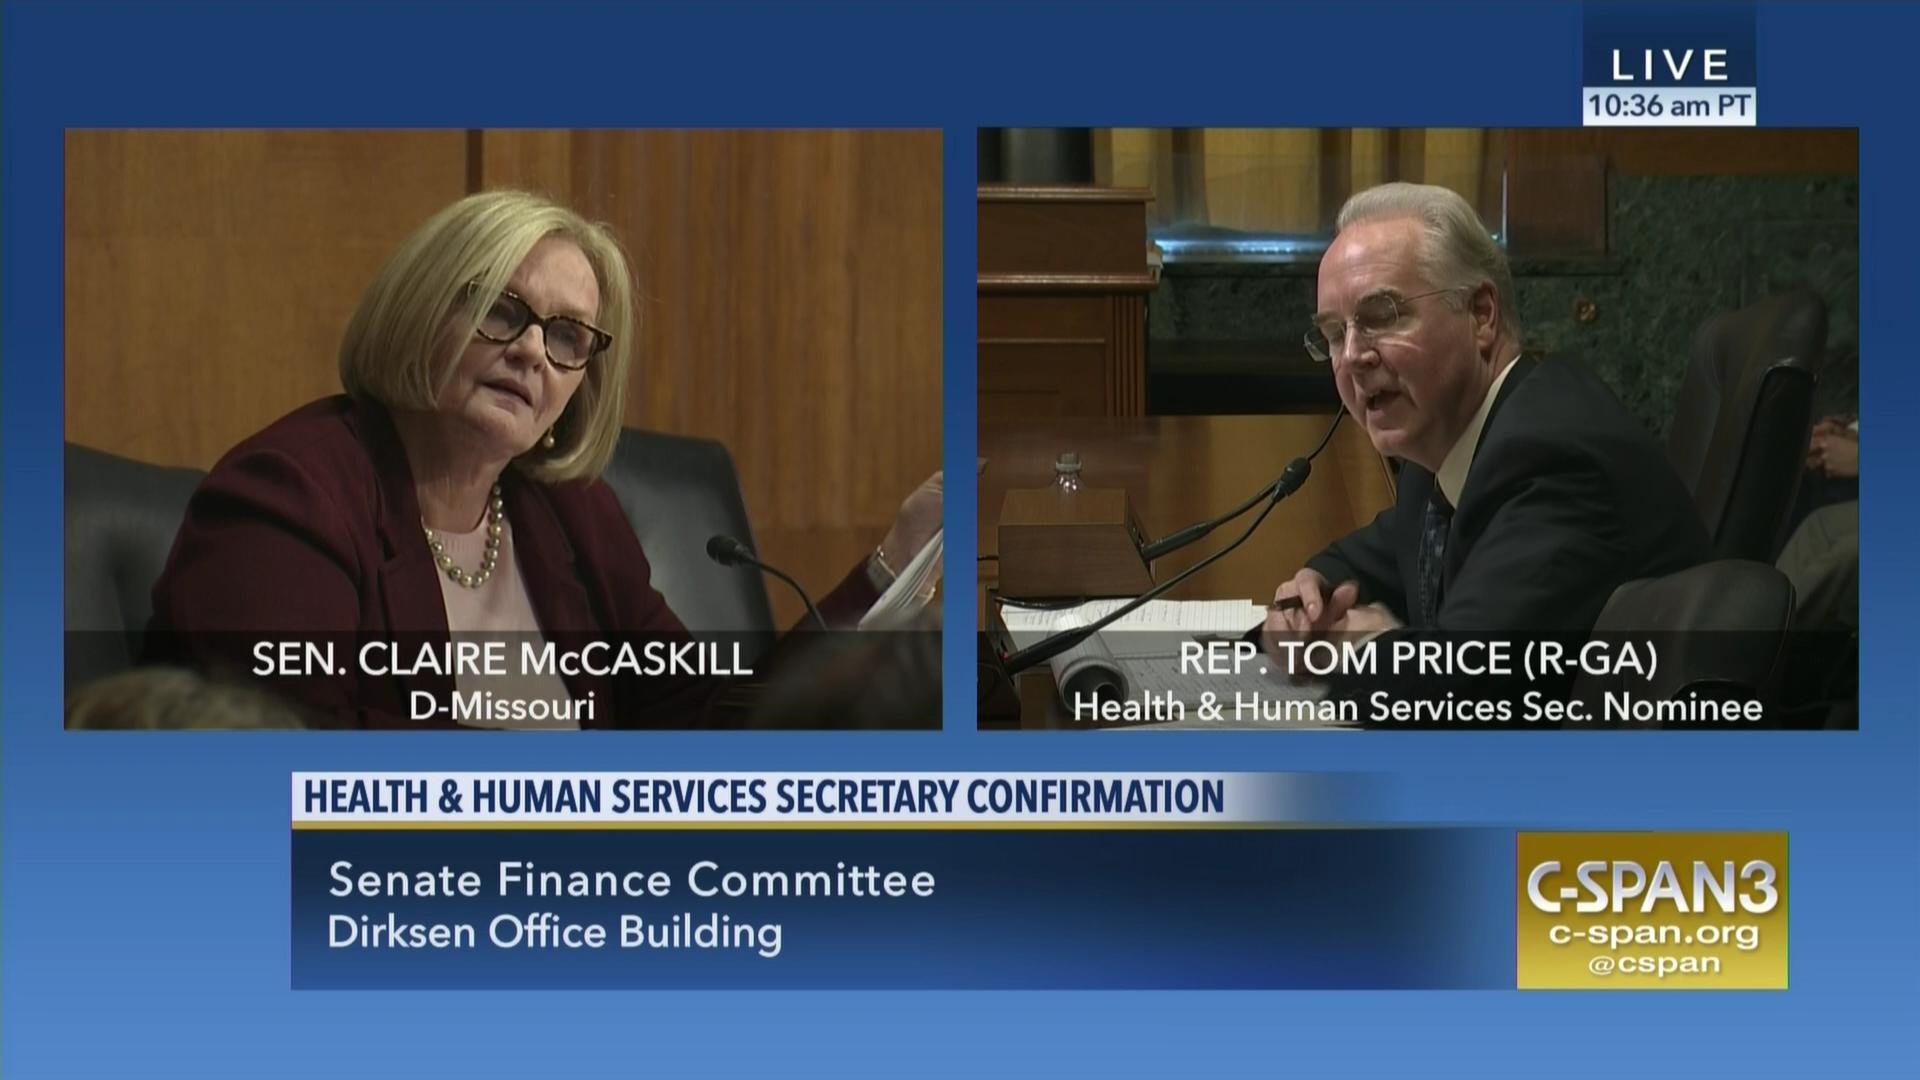 Experts Trumpcare Places Autism >> Sen Mccaskill Questions Rep Price On Medicaid Block Grants C